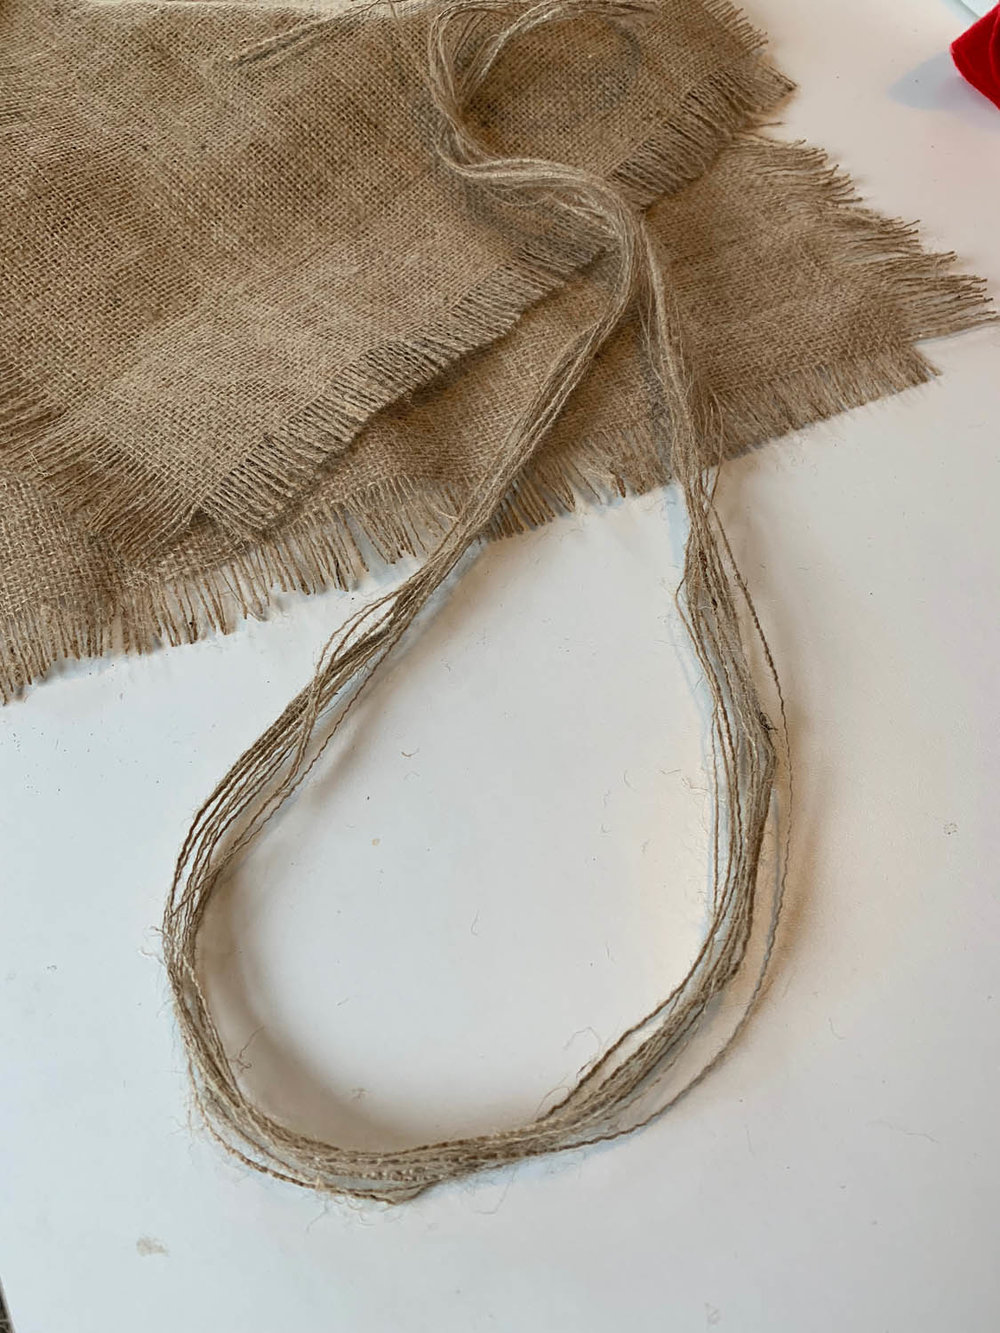 burlap scraps used as ribbon to embellish gifts